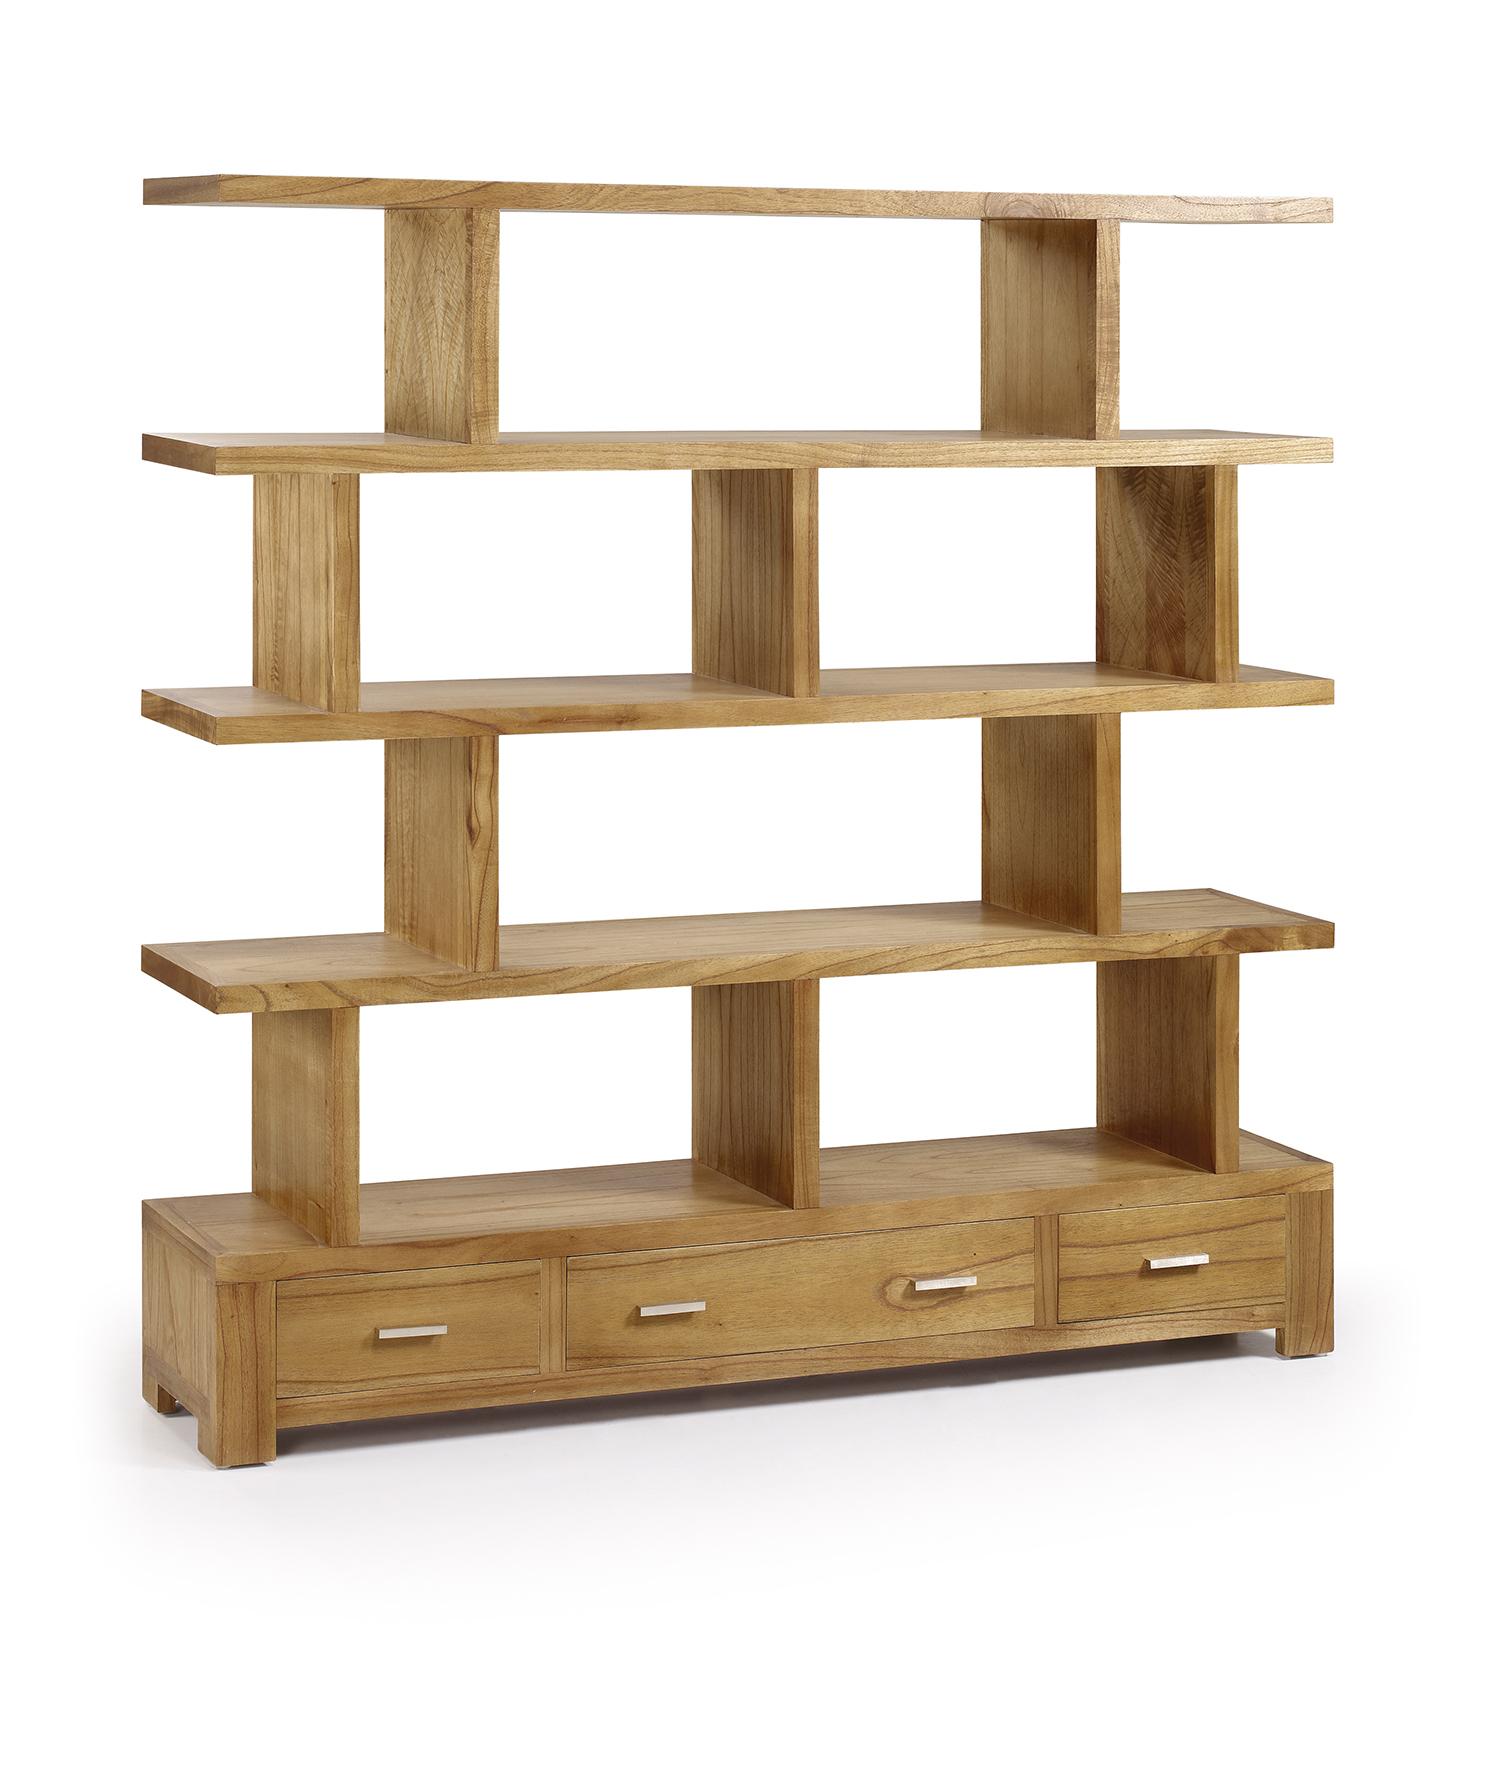 biblioth que de s paration en bois naturel 3 tiroirs. Black Bedroom Furniture Sets. Home Design Ideas